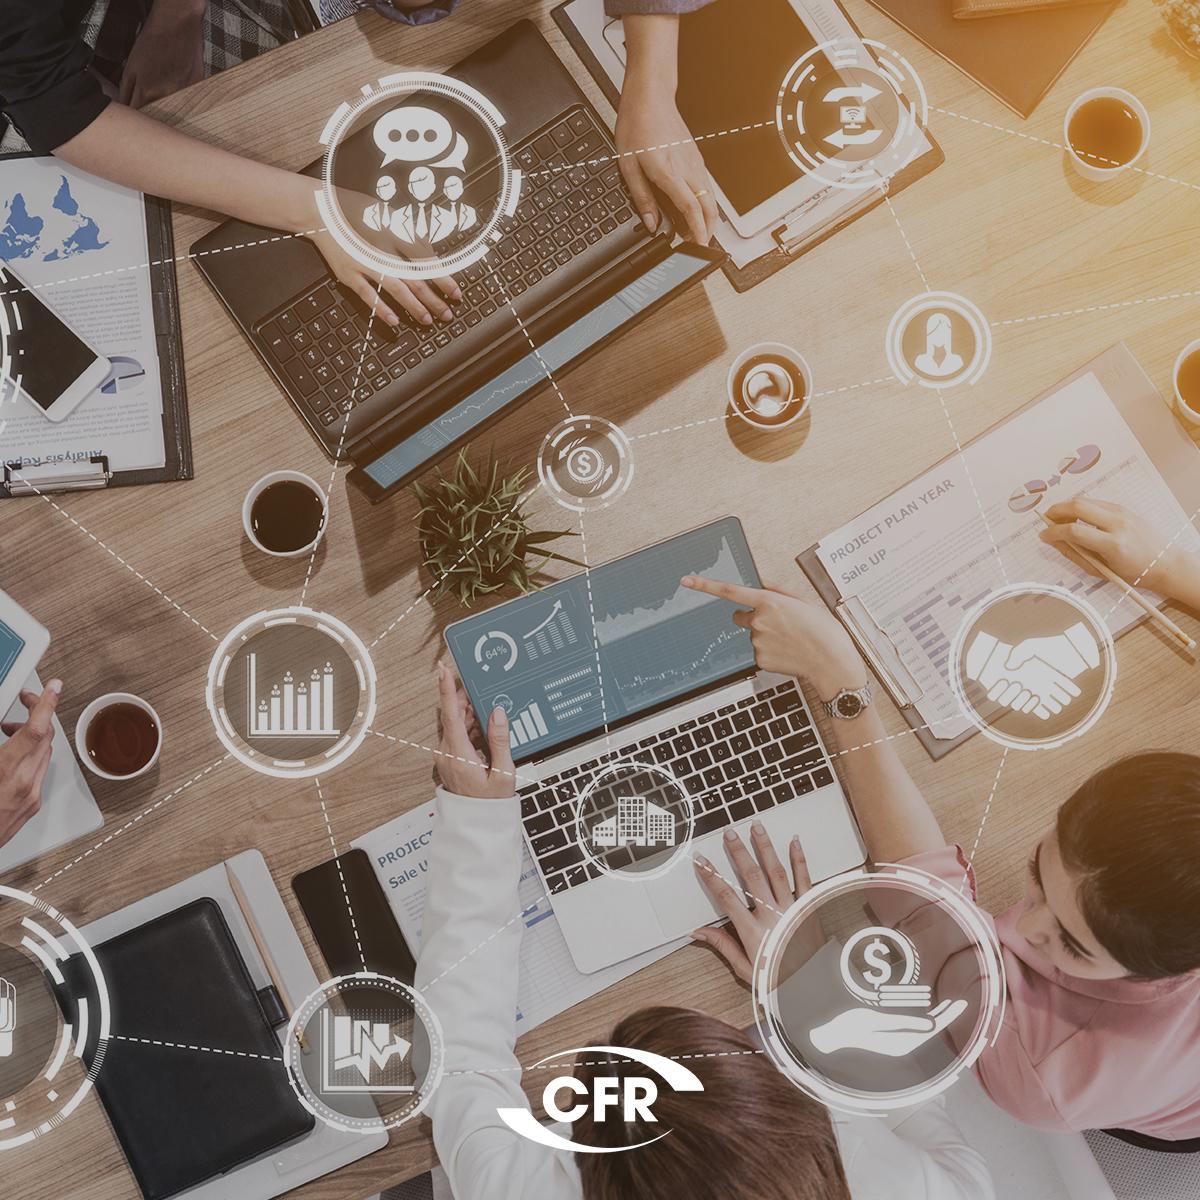 Small Research Company, Big Research Reach